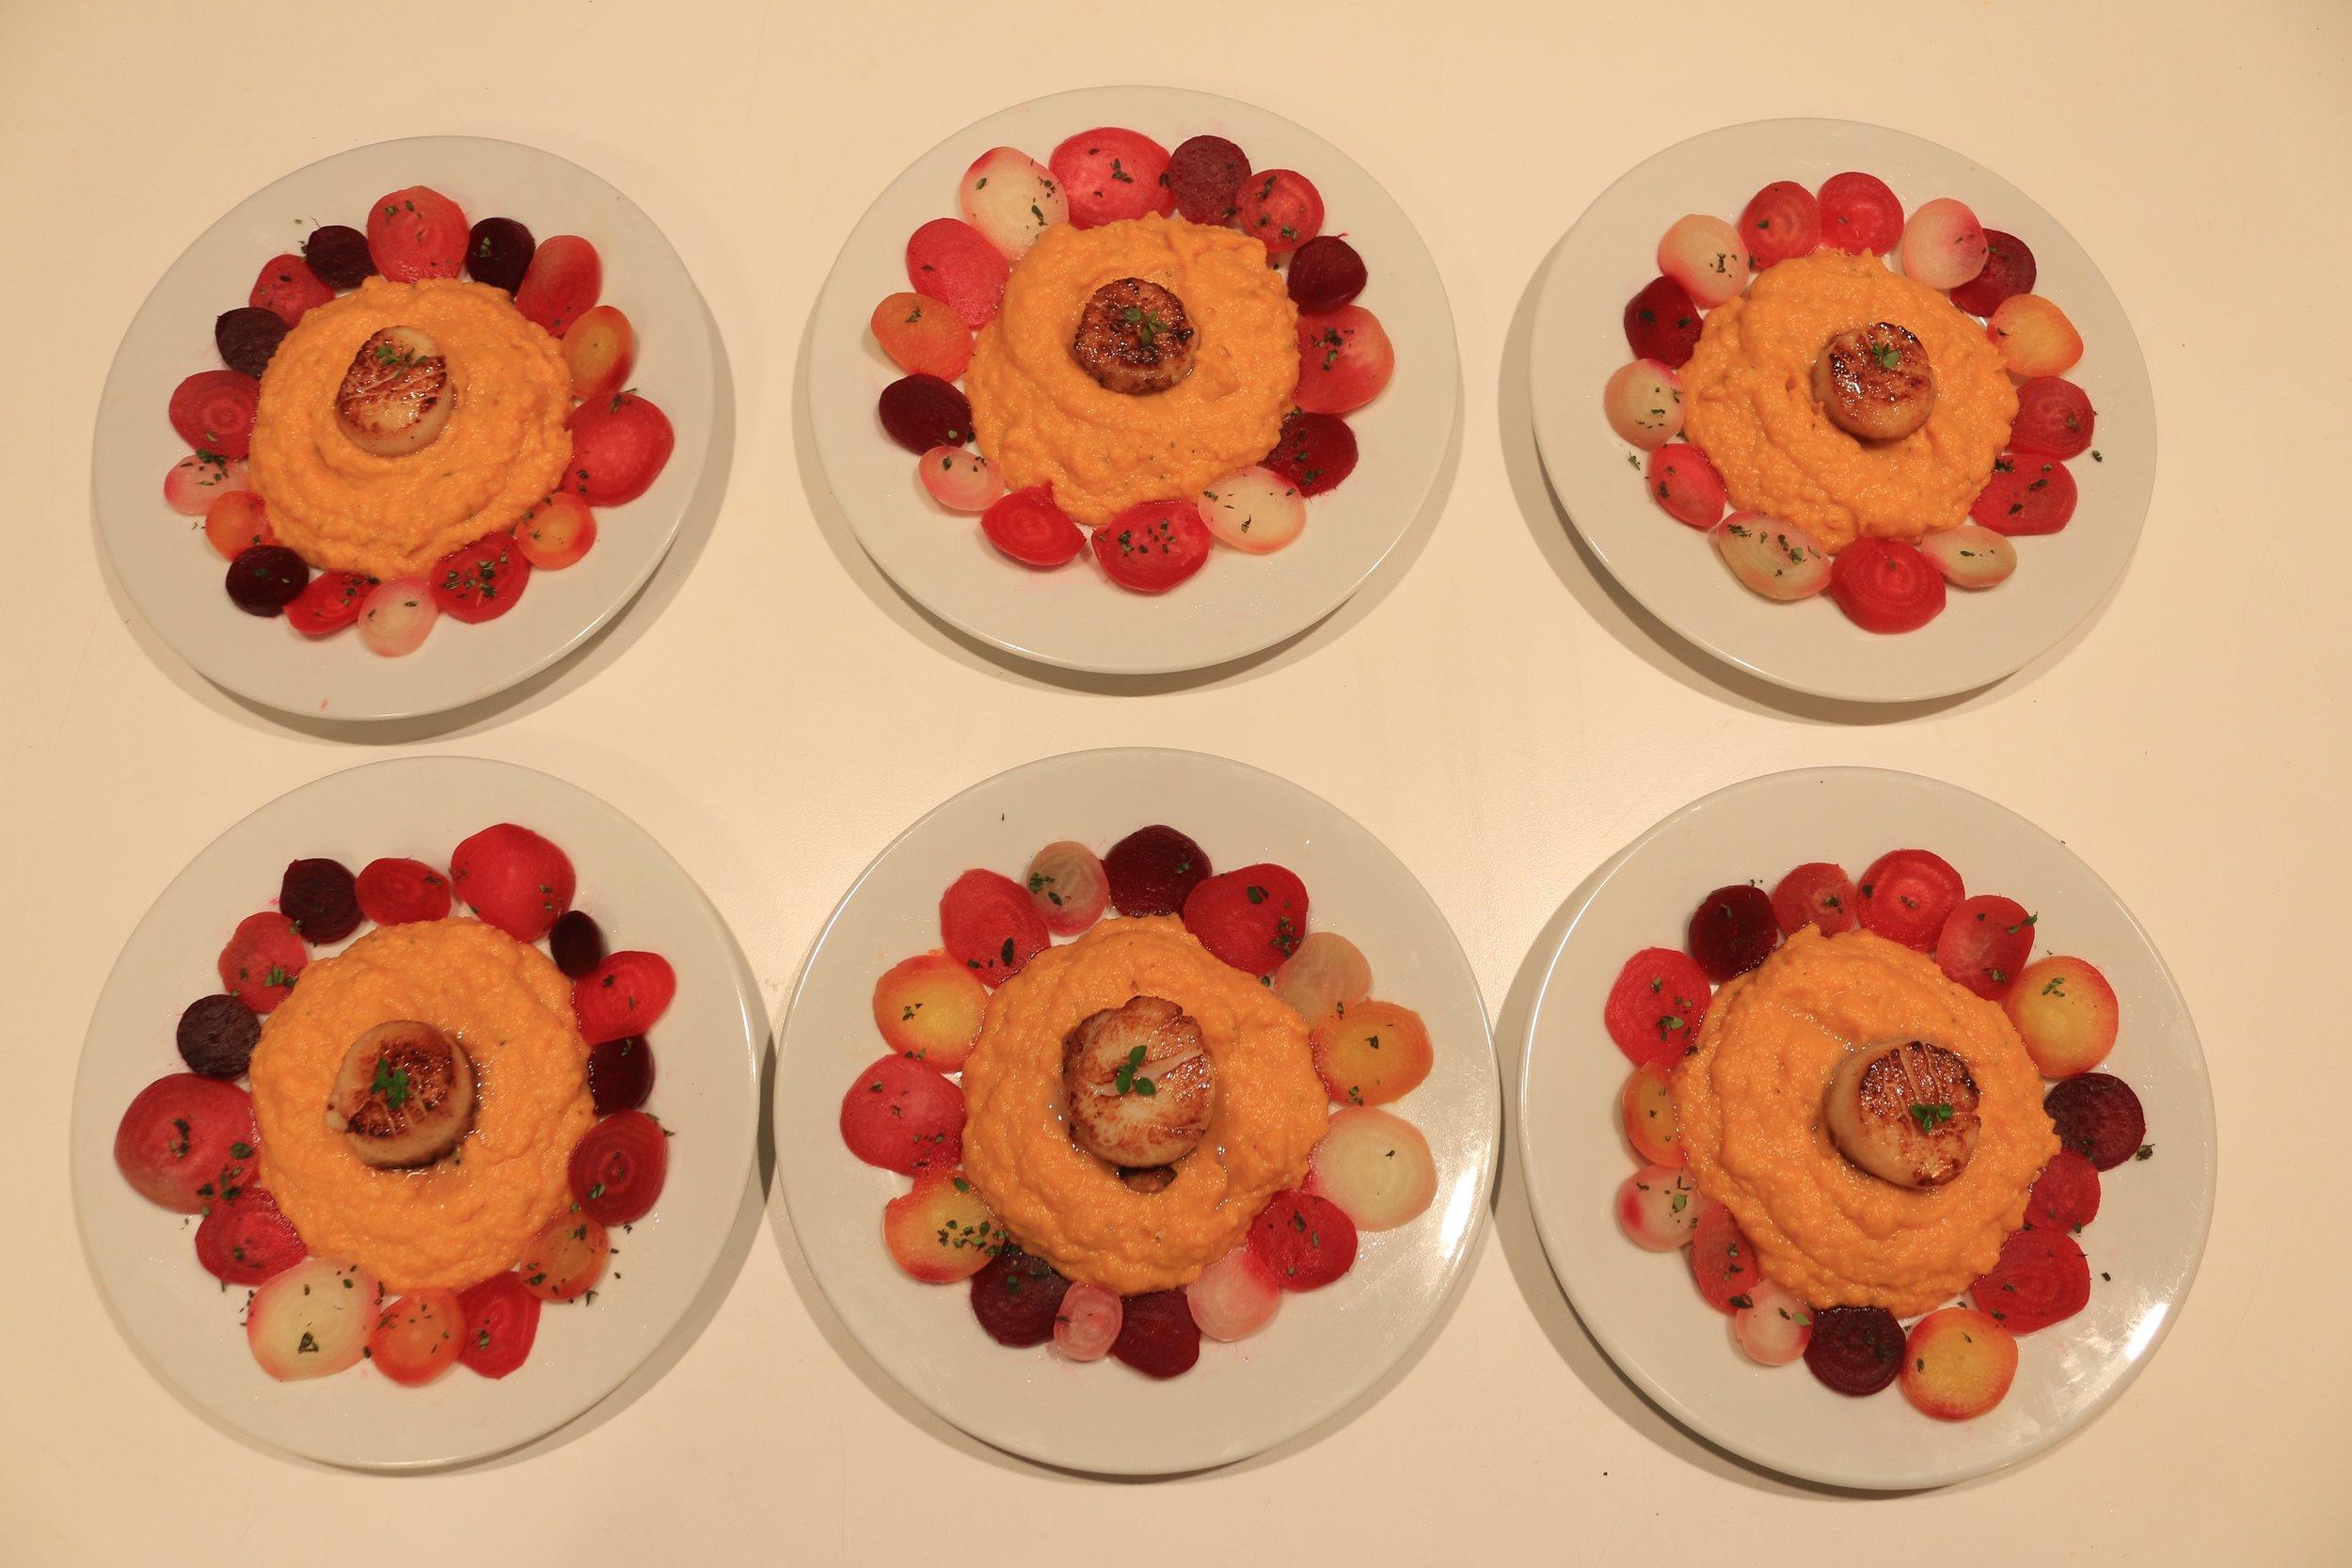 Colorful-beet-sweet-potato-scallops